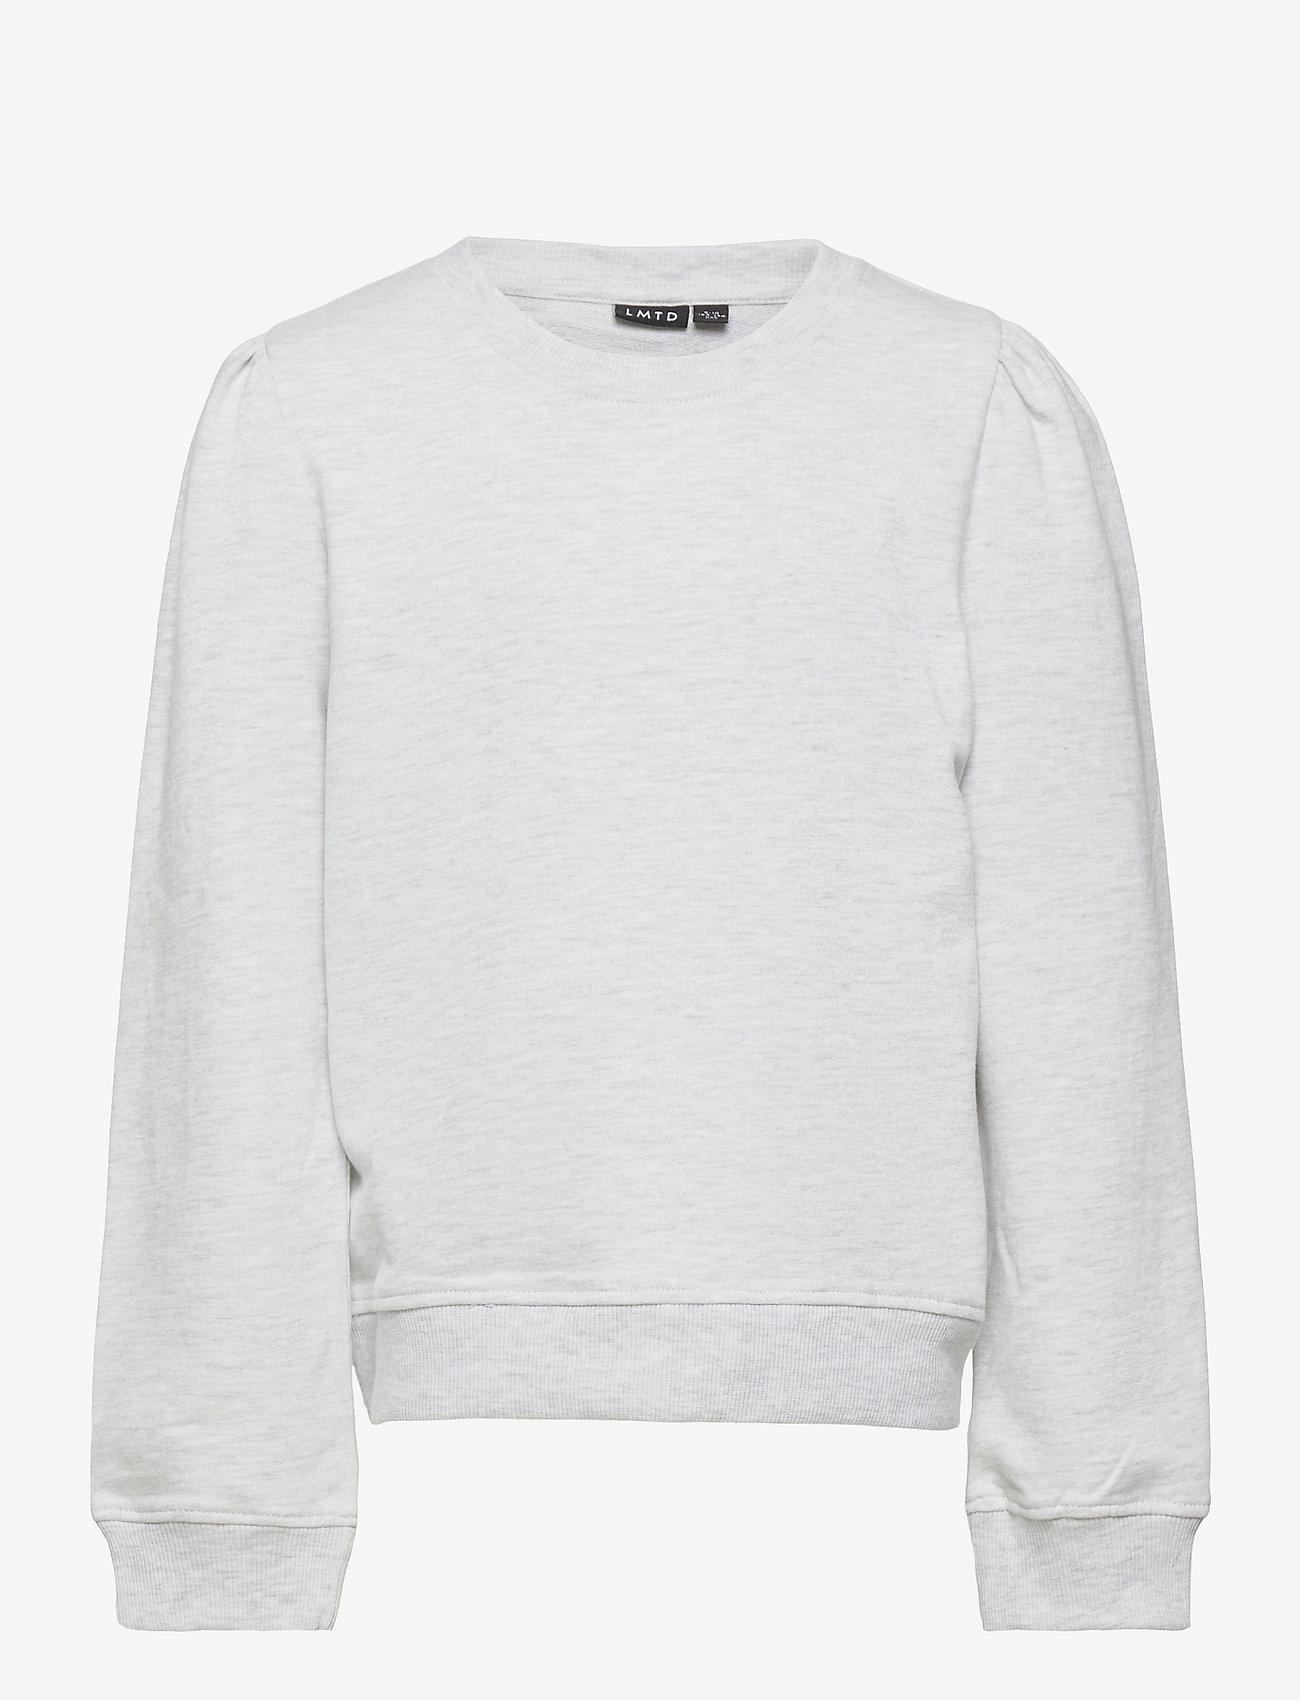 LMTD - NLFFATIAN LS SHORT SWEAT - sweatshirts - oatmeal - 0